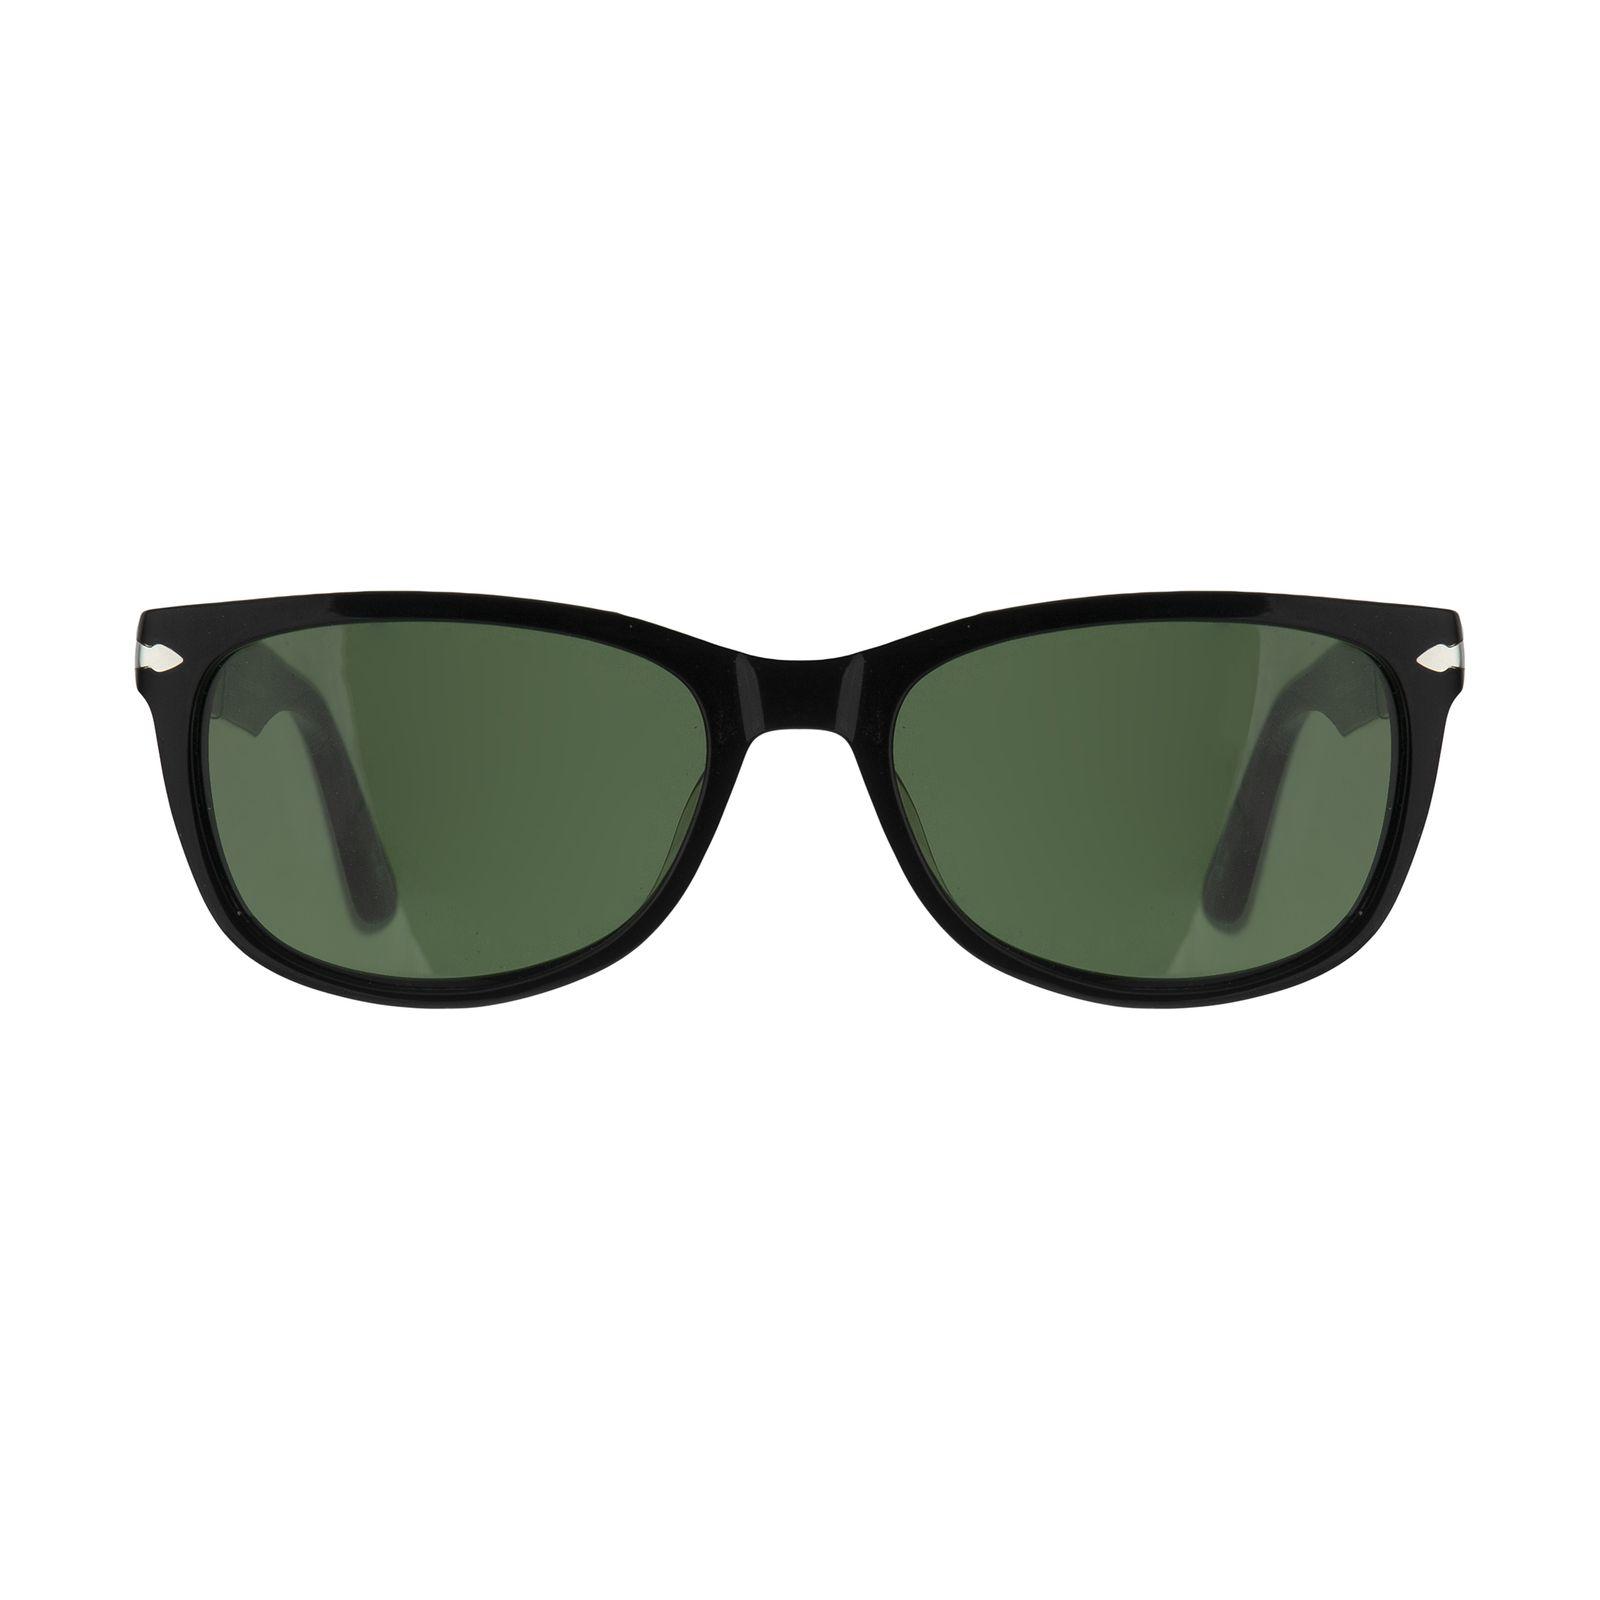 عینک آفتابی پرسول مدل 2953 -  - 2